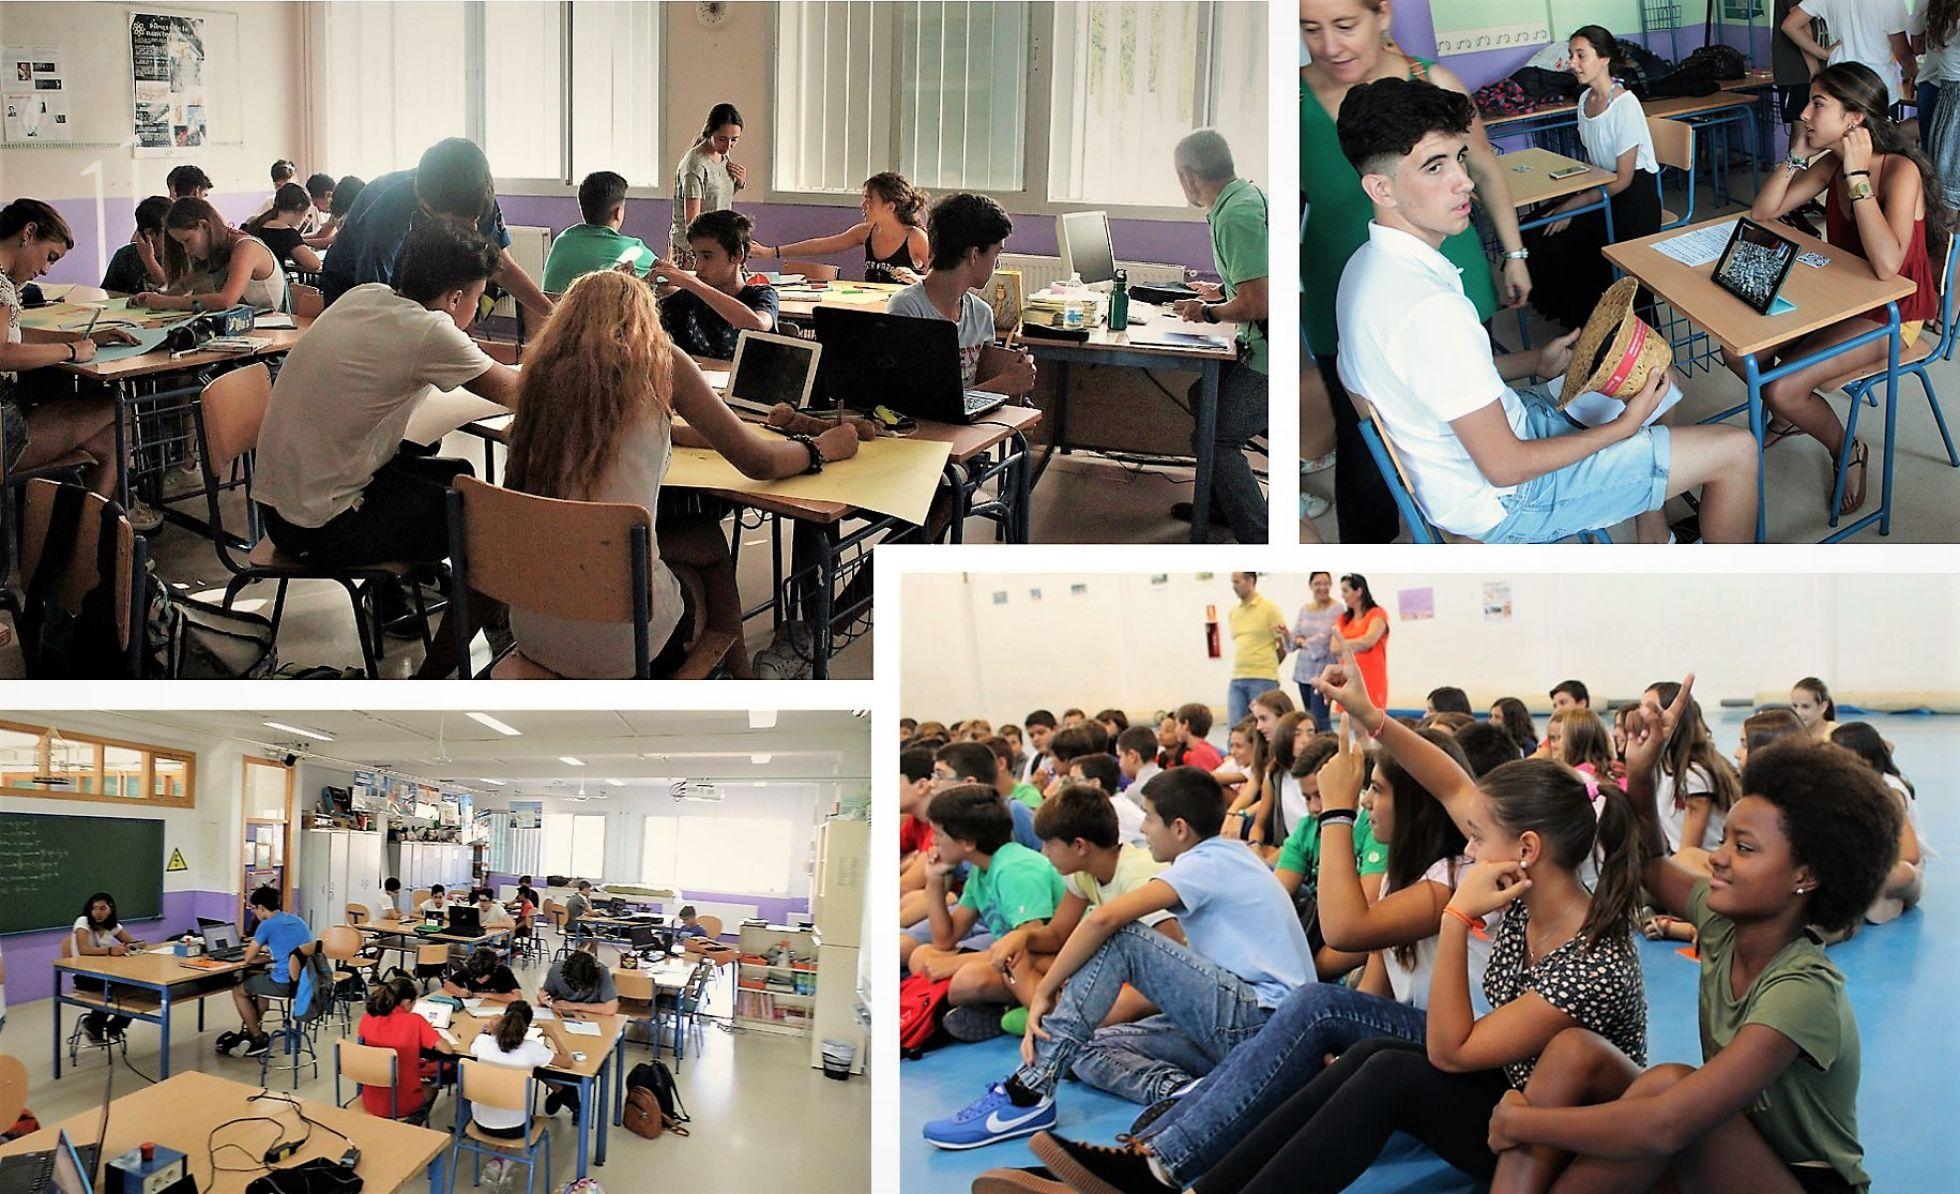 Presentación del proyecto por Mª EUGENIA PÉREZ